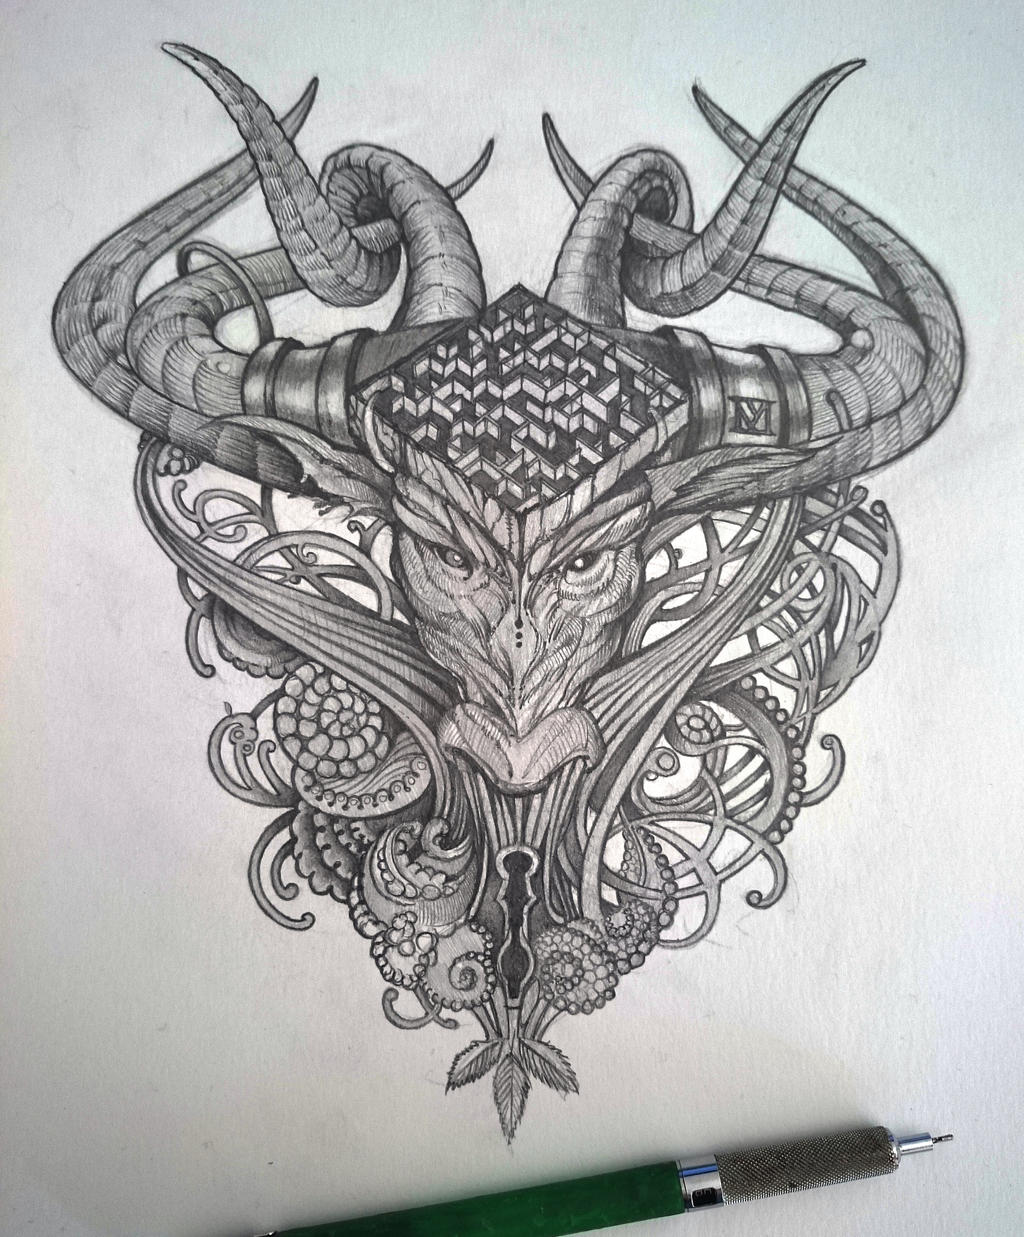 Minotaur head by fairwood59 on DeviantArt